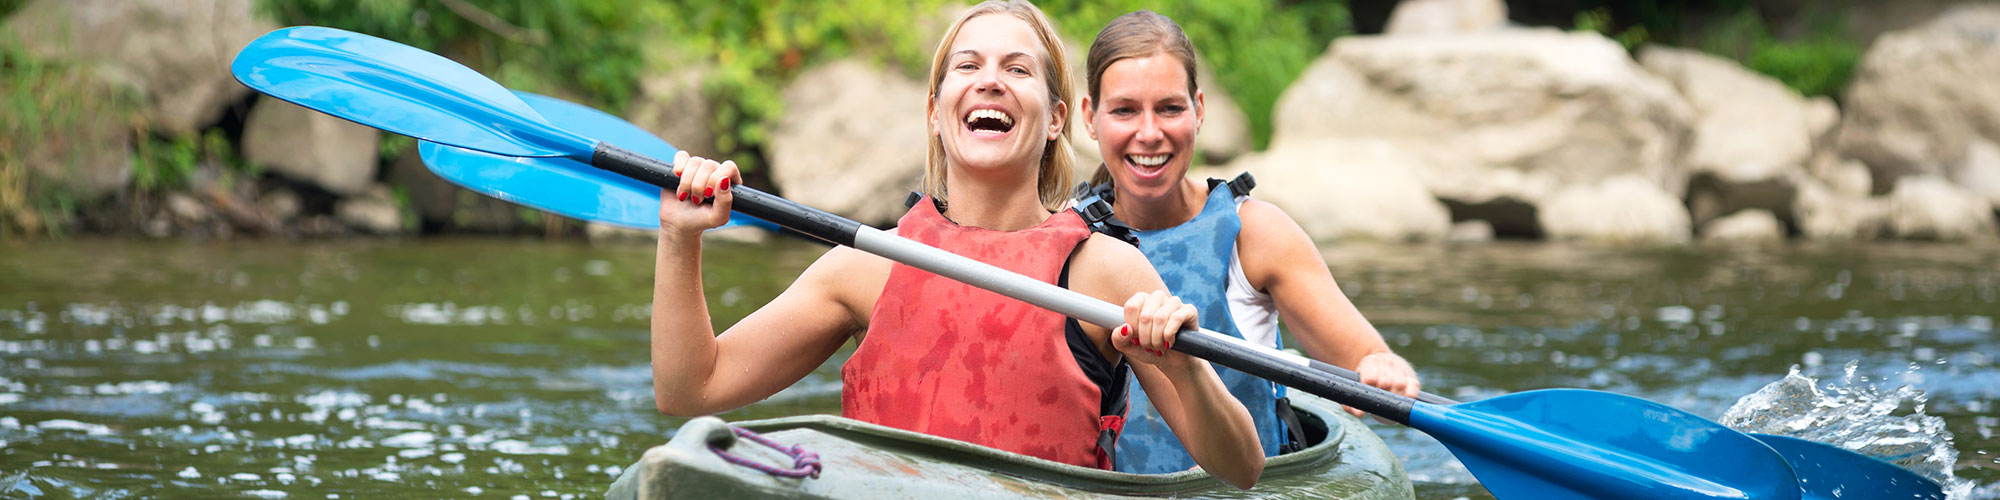 Sports & Adventure Tours in Lanka